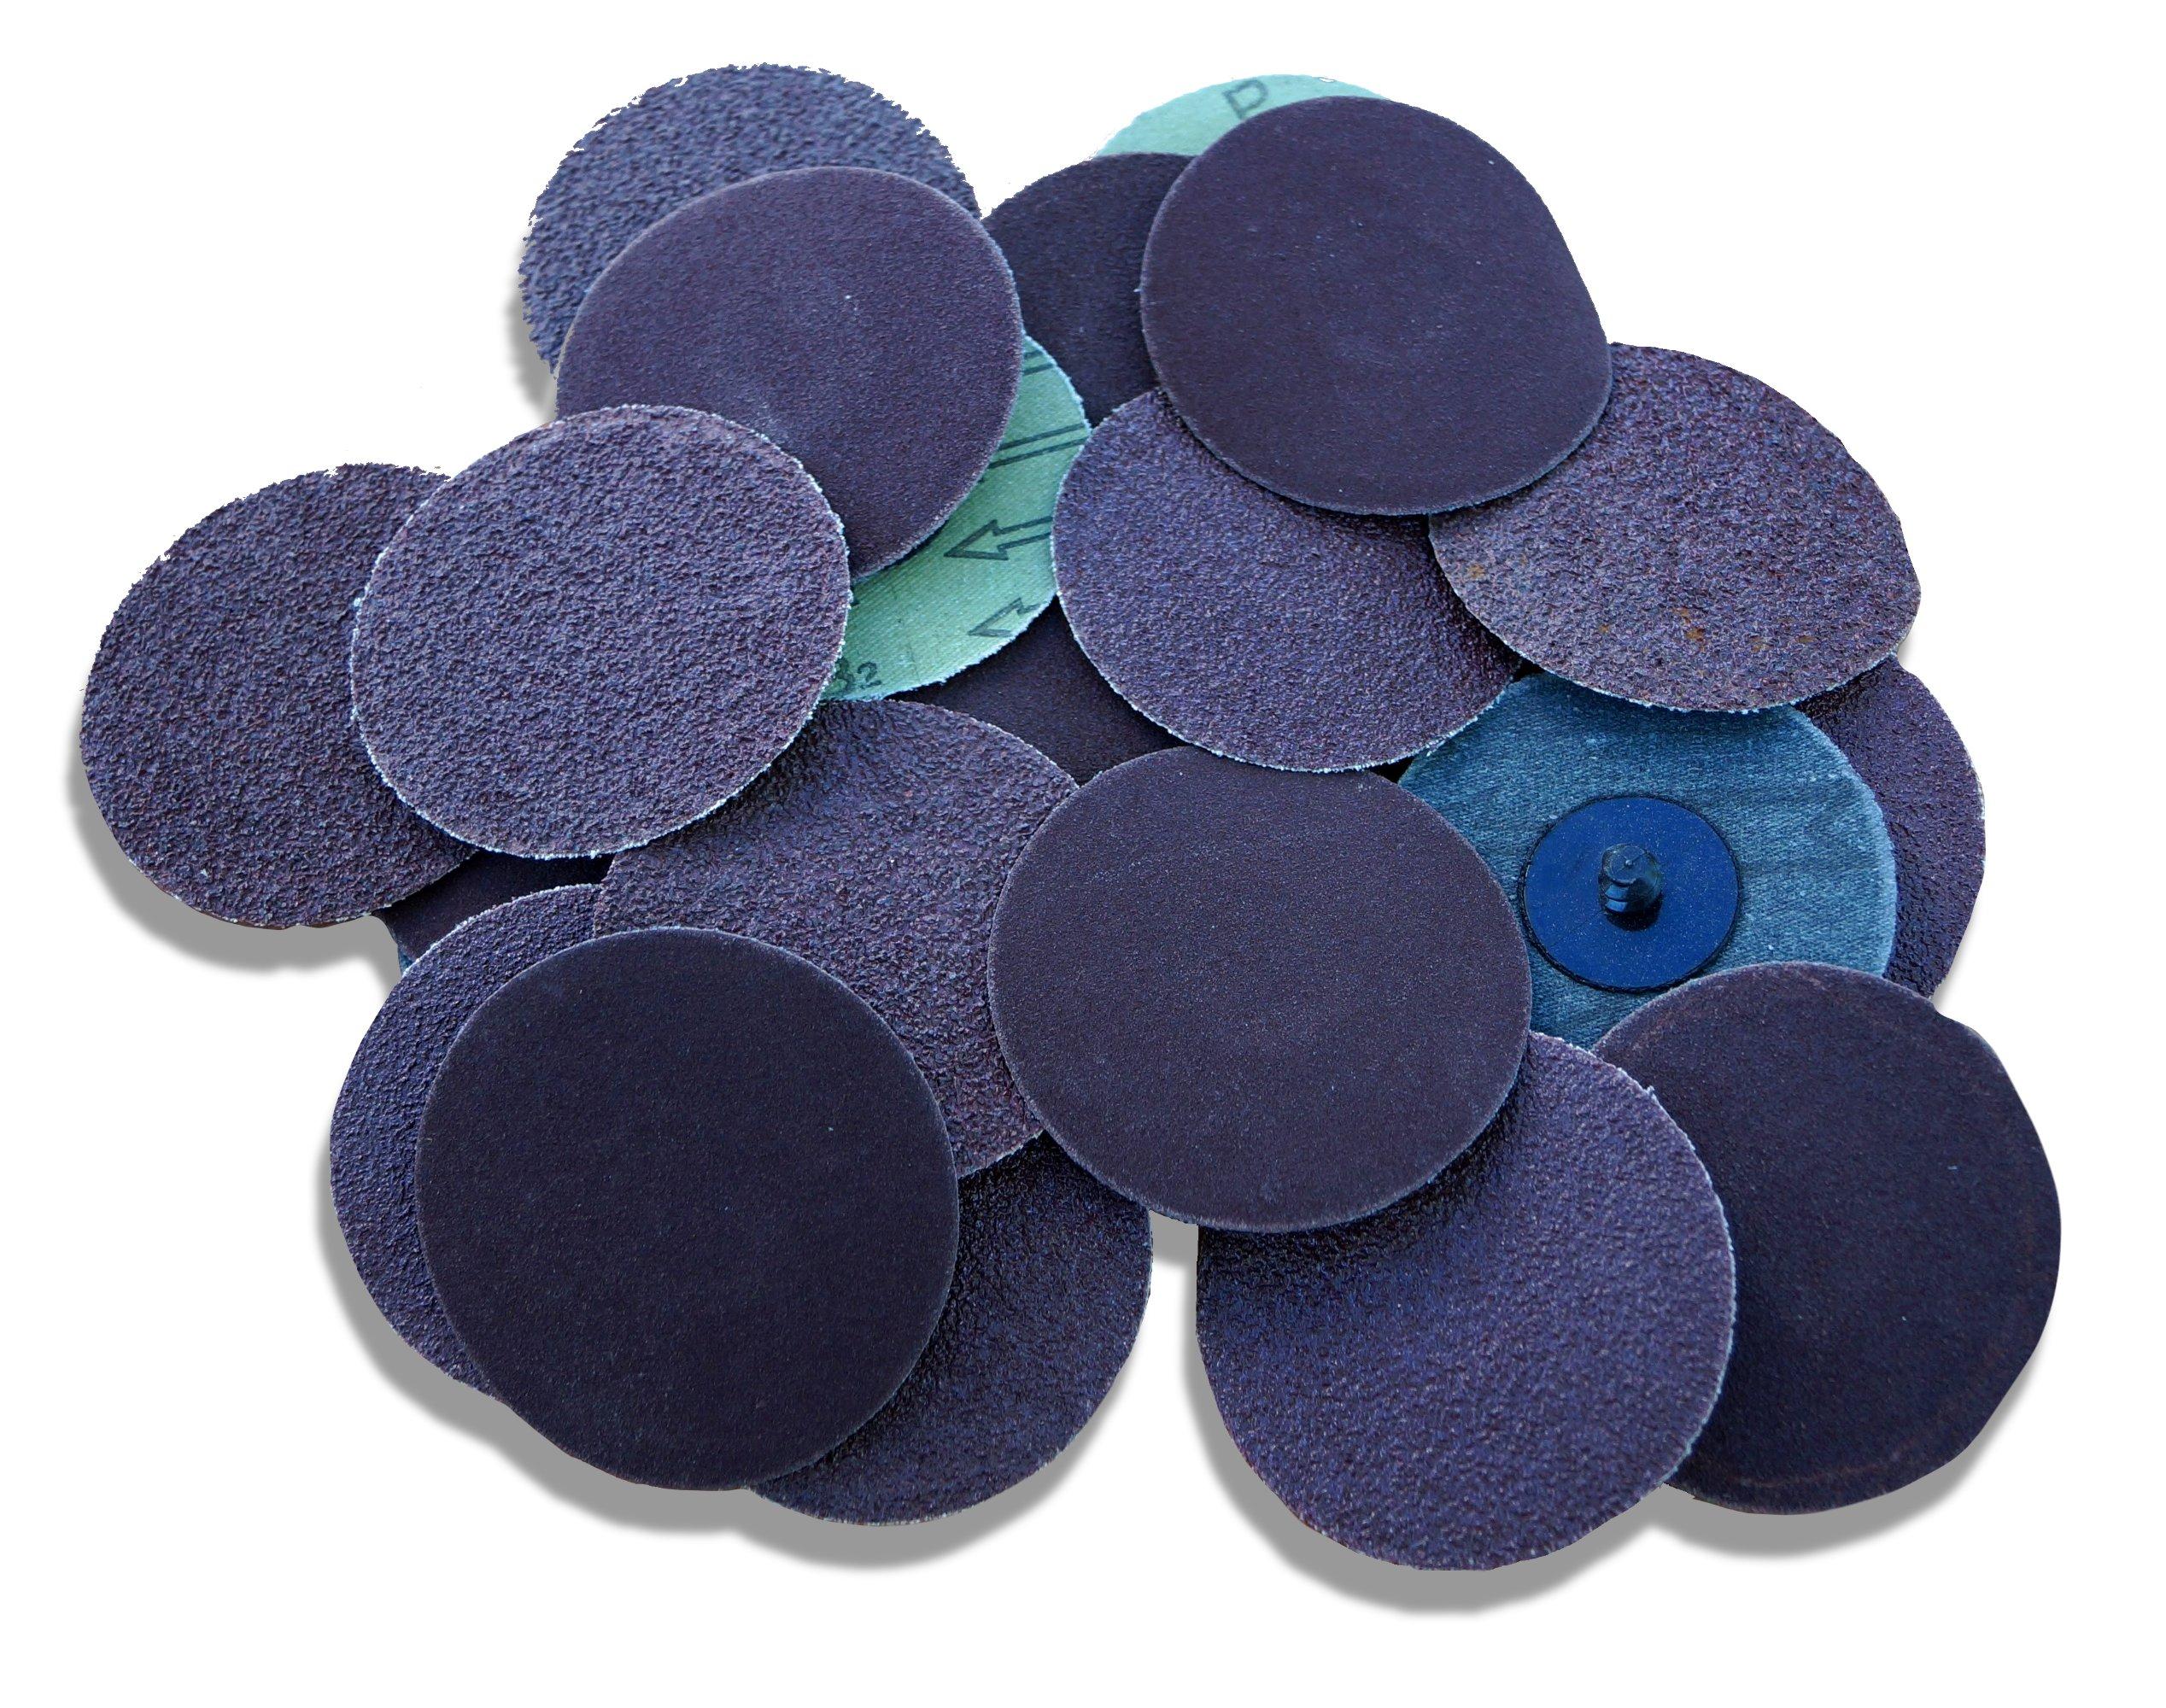 25pc 3'' Roloc Assorted 5 Each 36-220 Grit R Type Sanding Abrasive Discs